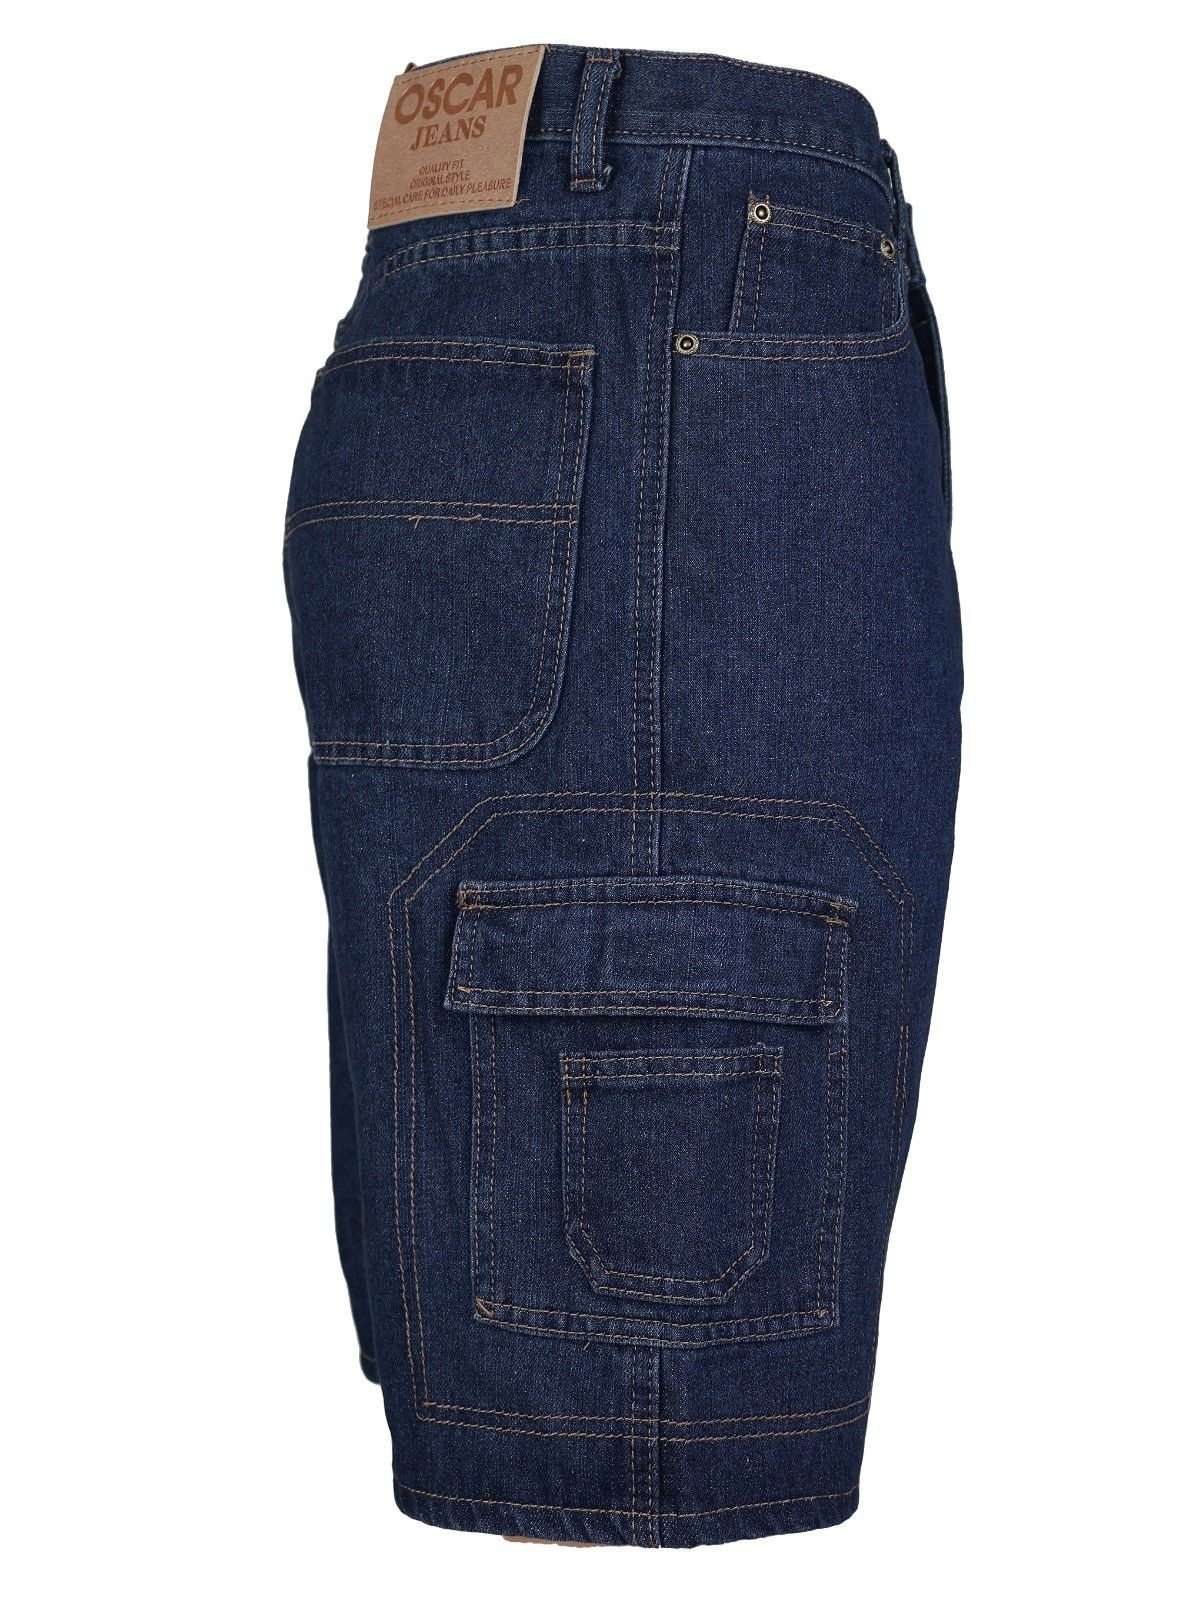 Men-039-s-Premium-Cotton-Multi-Pocket-Relaxed-Fit-Stonewash-Denim-Jean-Cargo-Shorts thumbnail 5